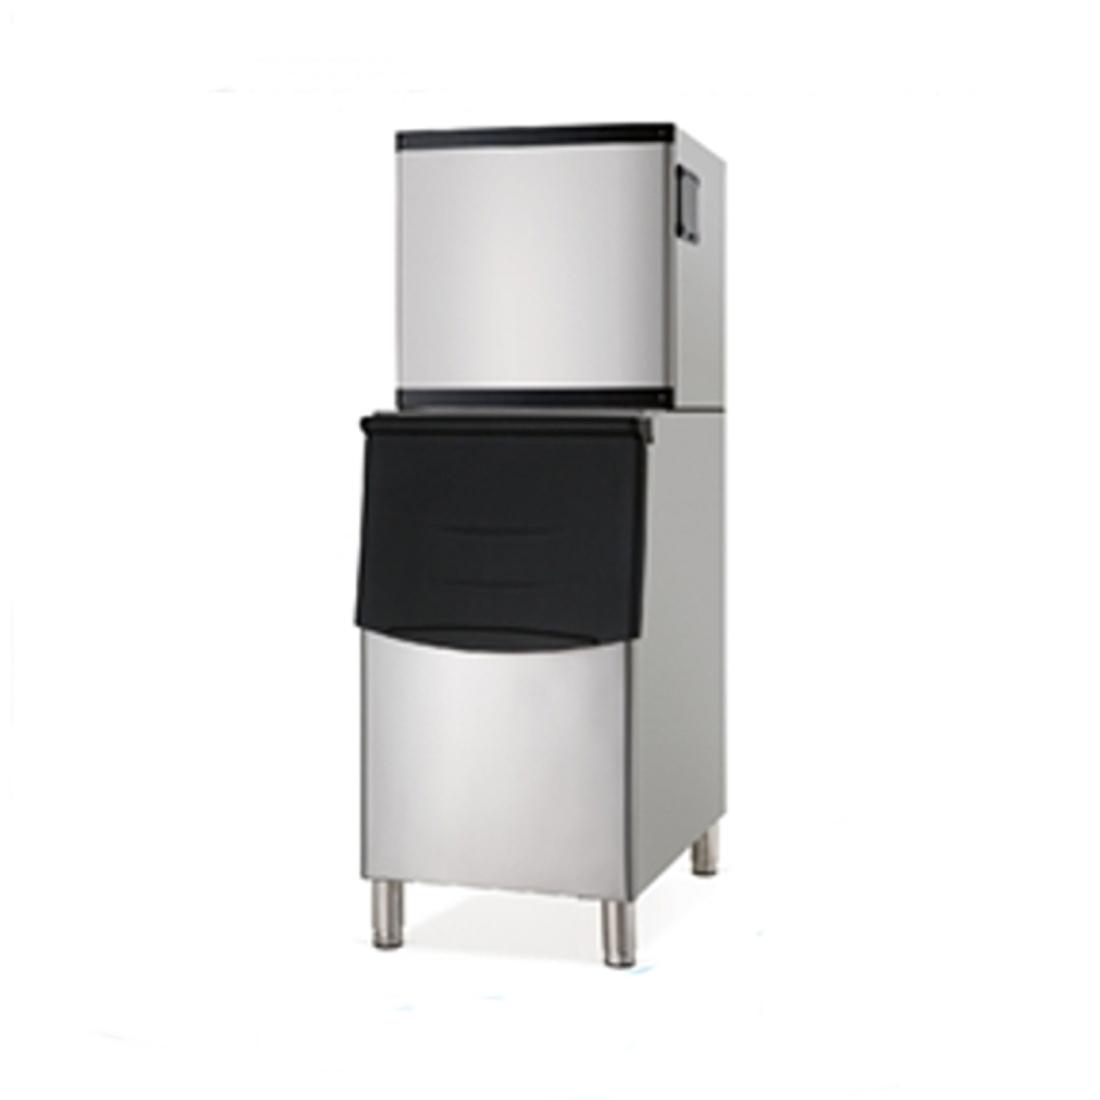 Granular Ice Machine - SN-358F